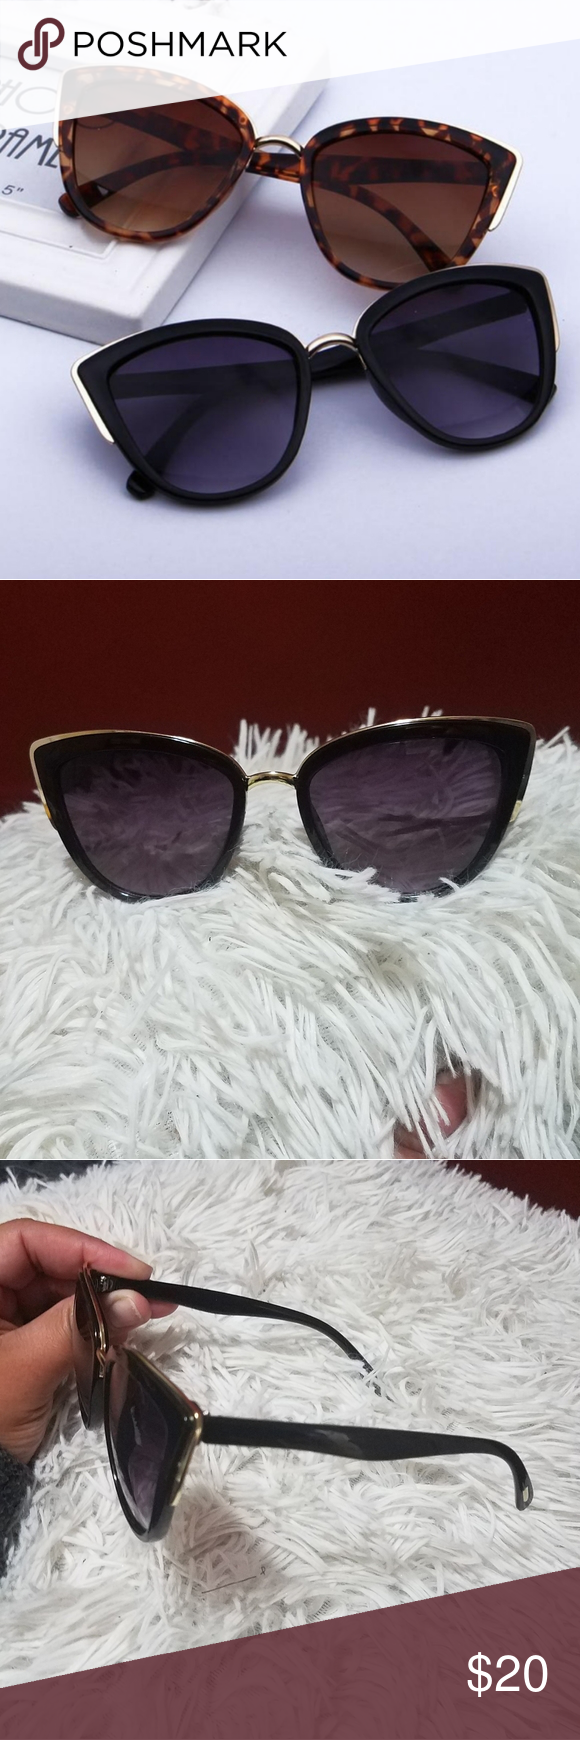 Black Cat Eye Sunglasses Boutique Black cat eye